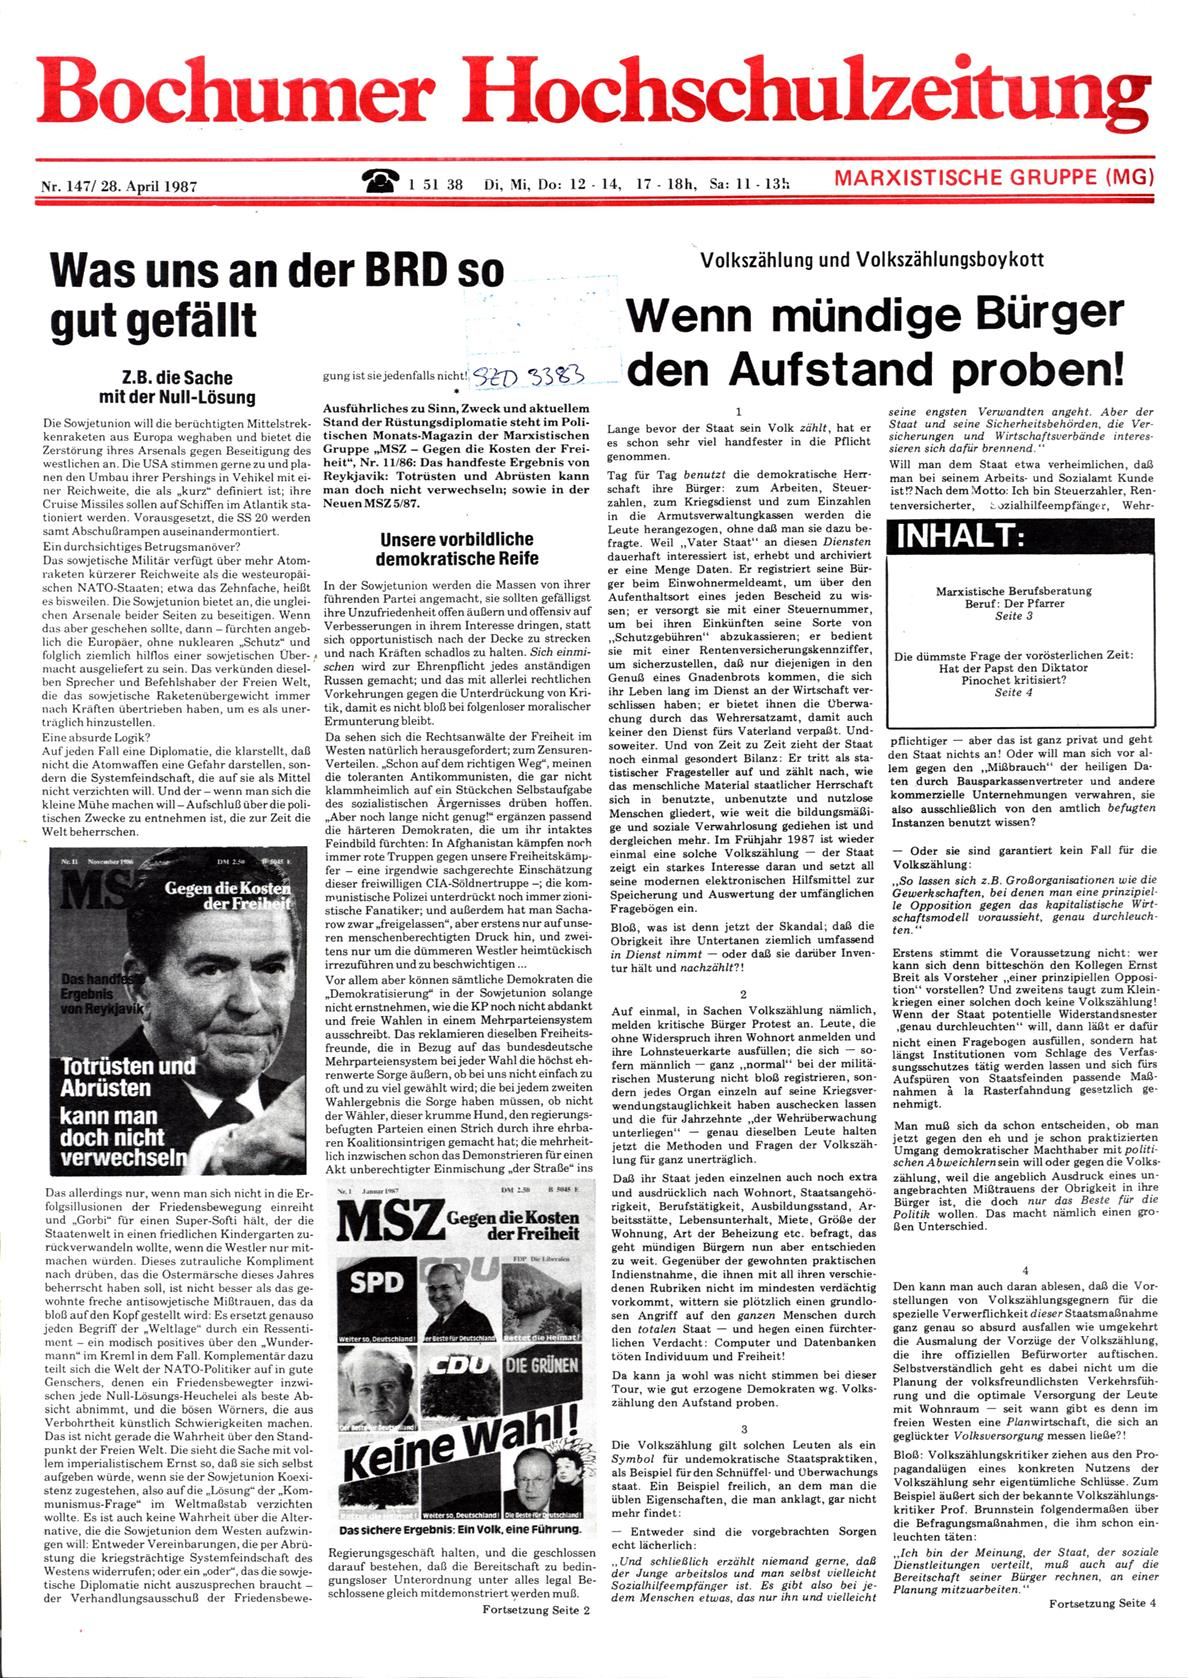 Bochum_BHZ_19870428_147_001